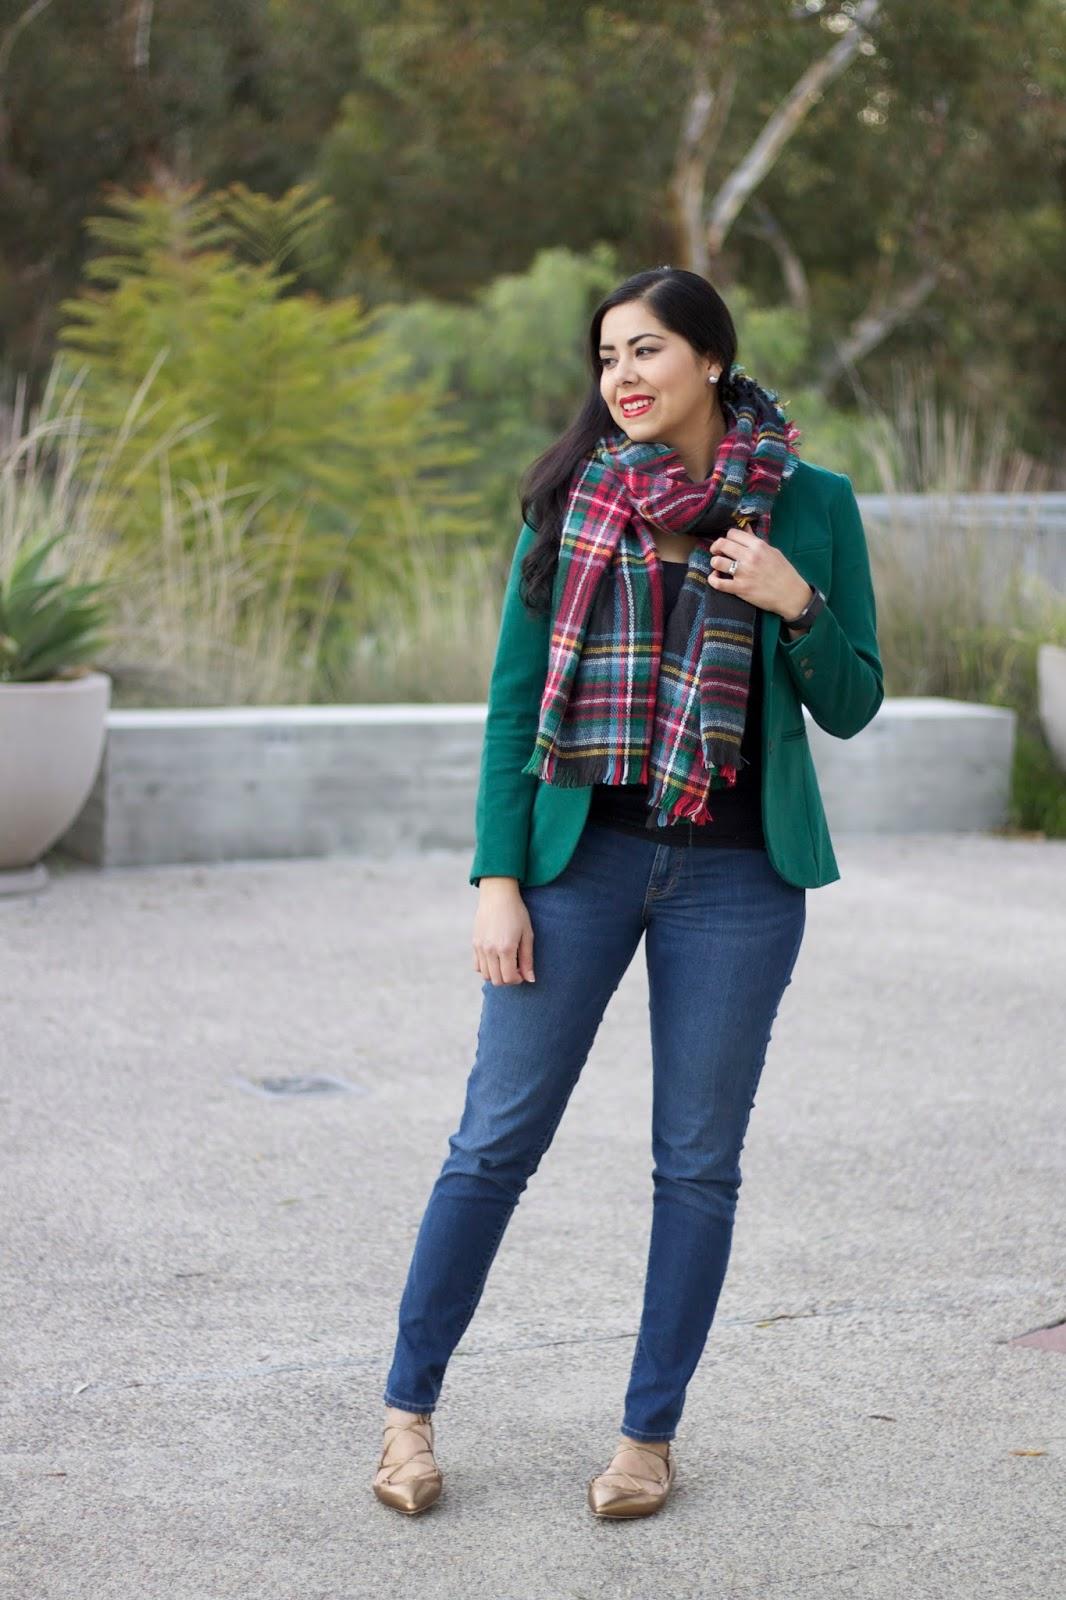 Plaid scarf outfit, target plaid scarf, Christmas in San Diego, San Diego Fashion Blogger, San Diego Style Bloggers